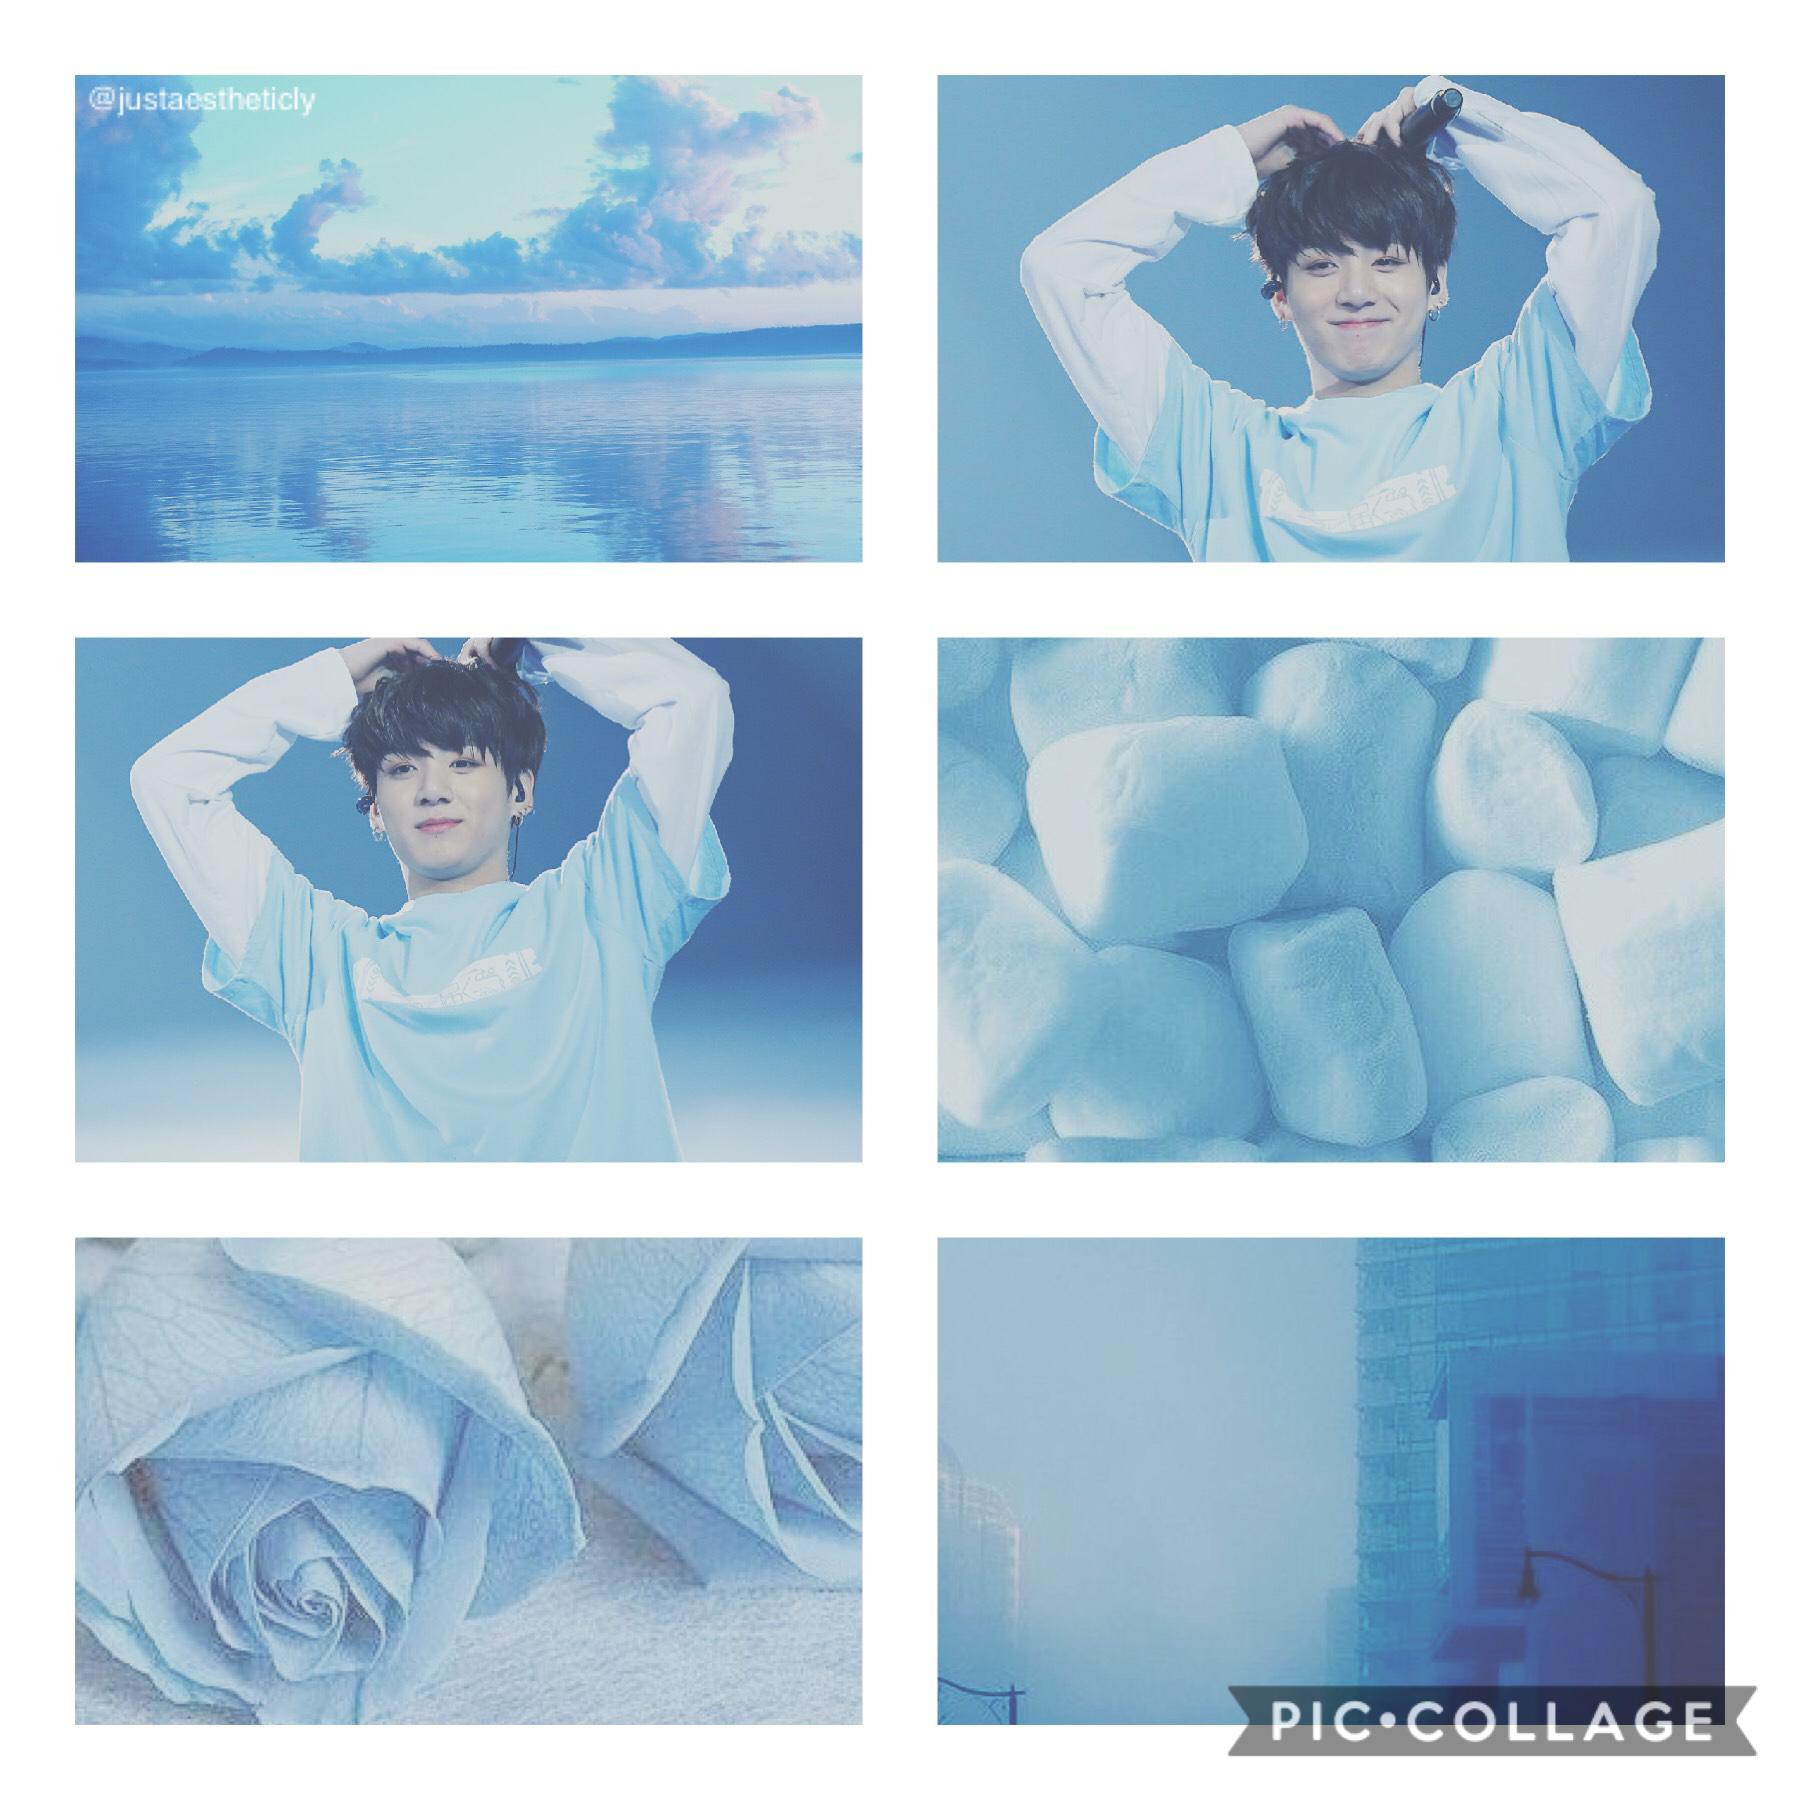 BTS Jungkook TaP Jungkook light blue Aesthetic/Moodboard Hope y'all like!